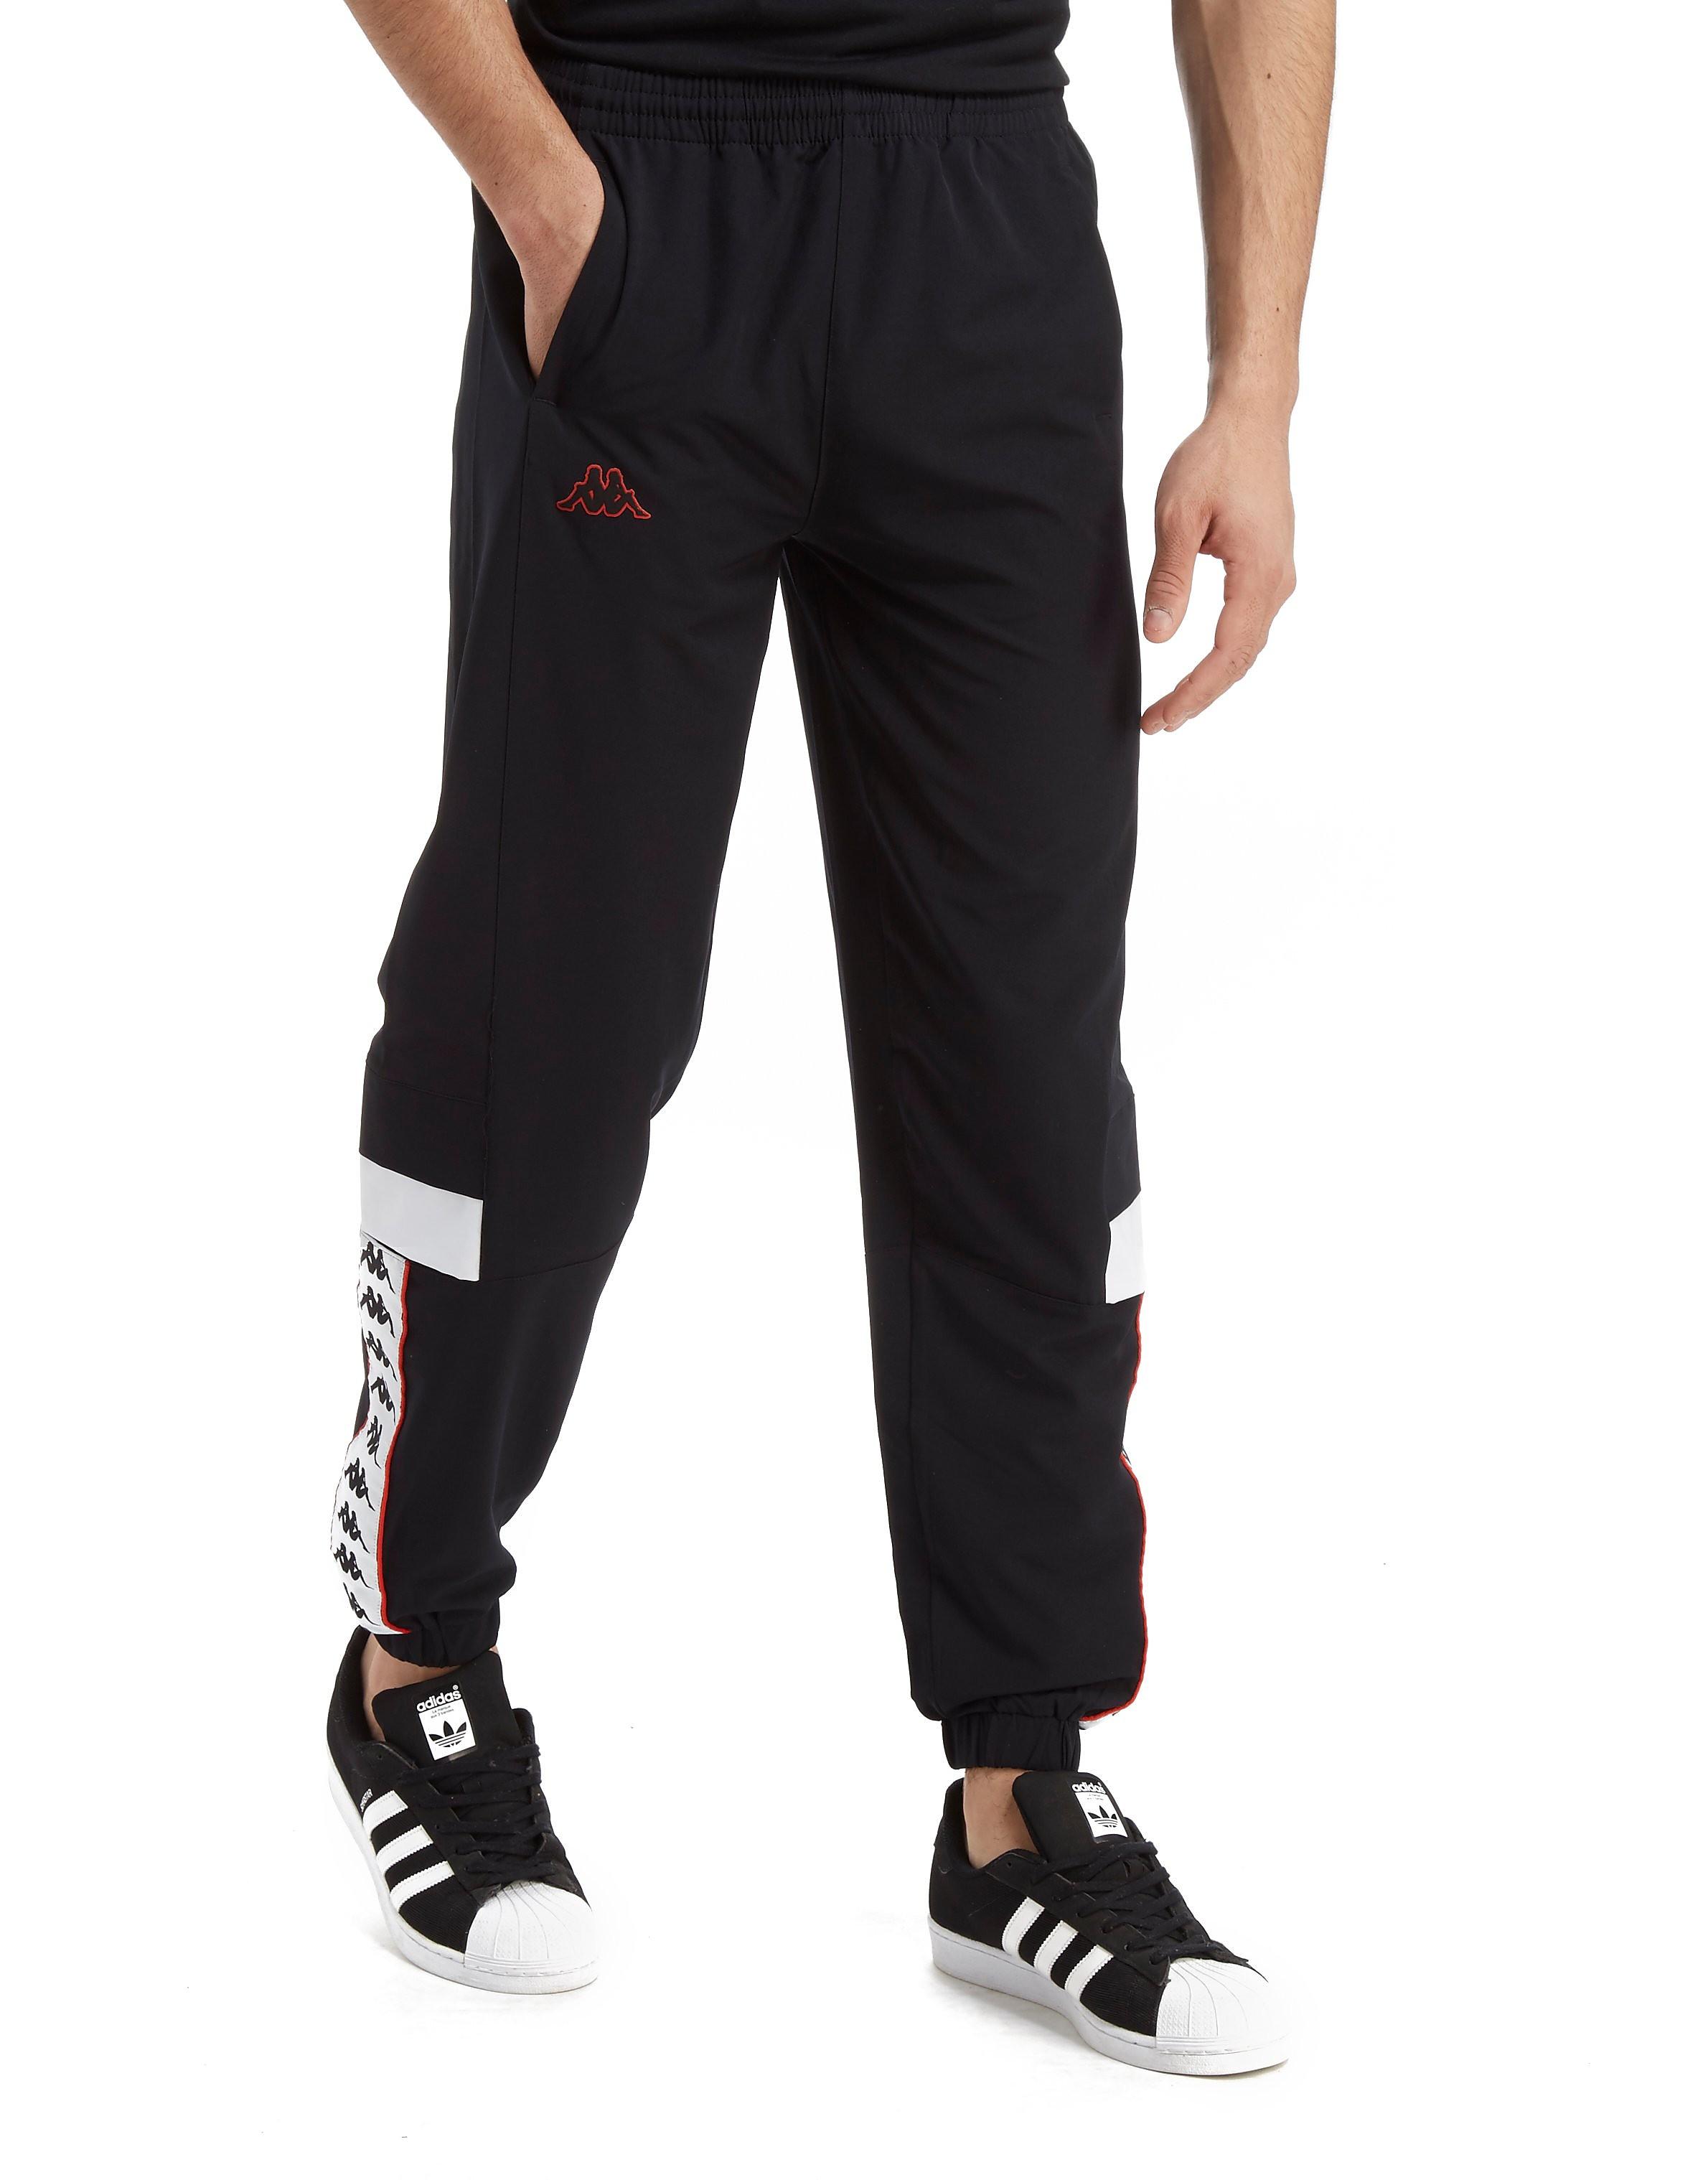 Kappa Arou Woven Pants